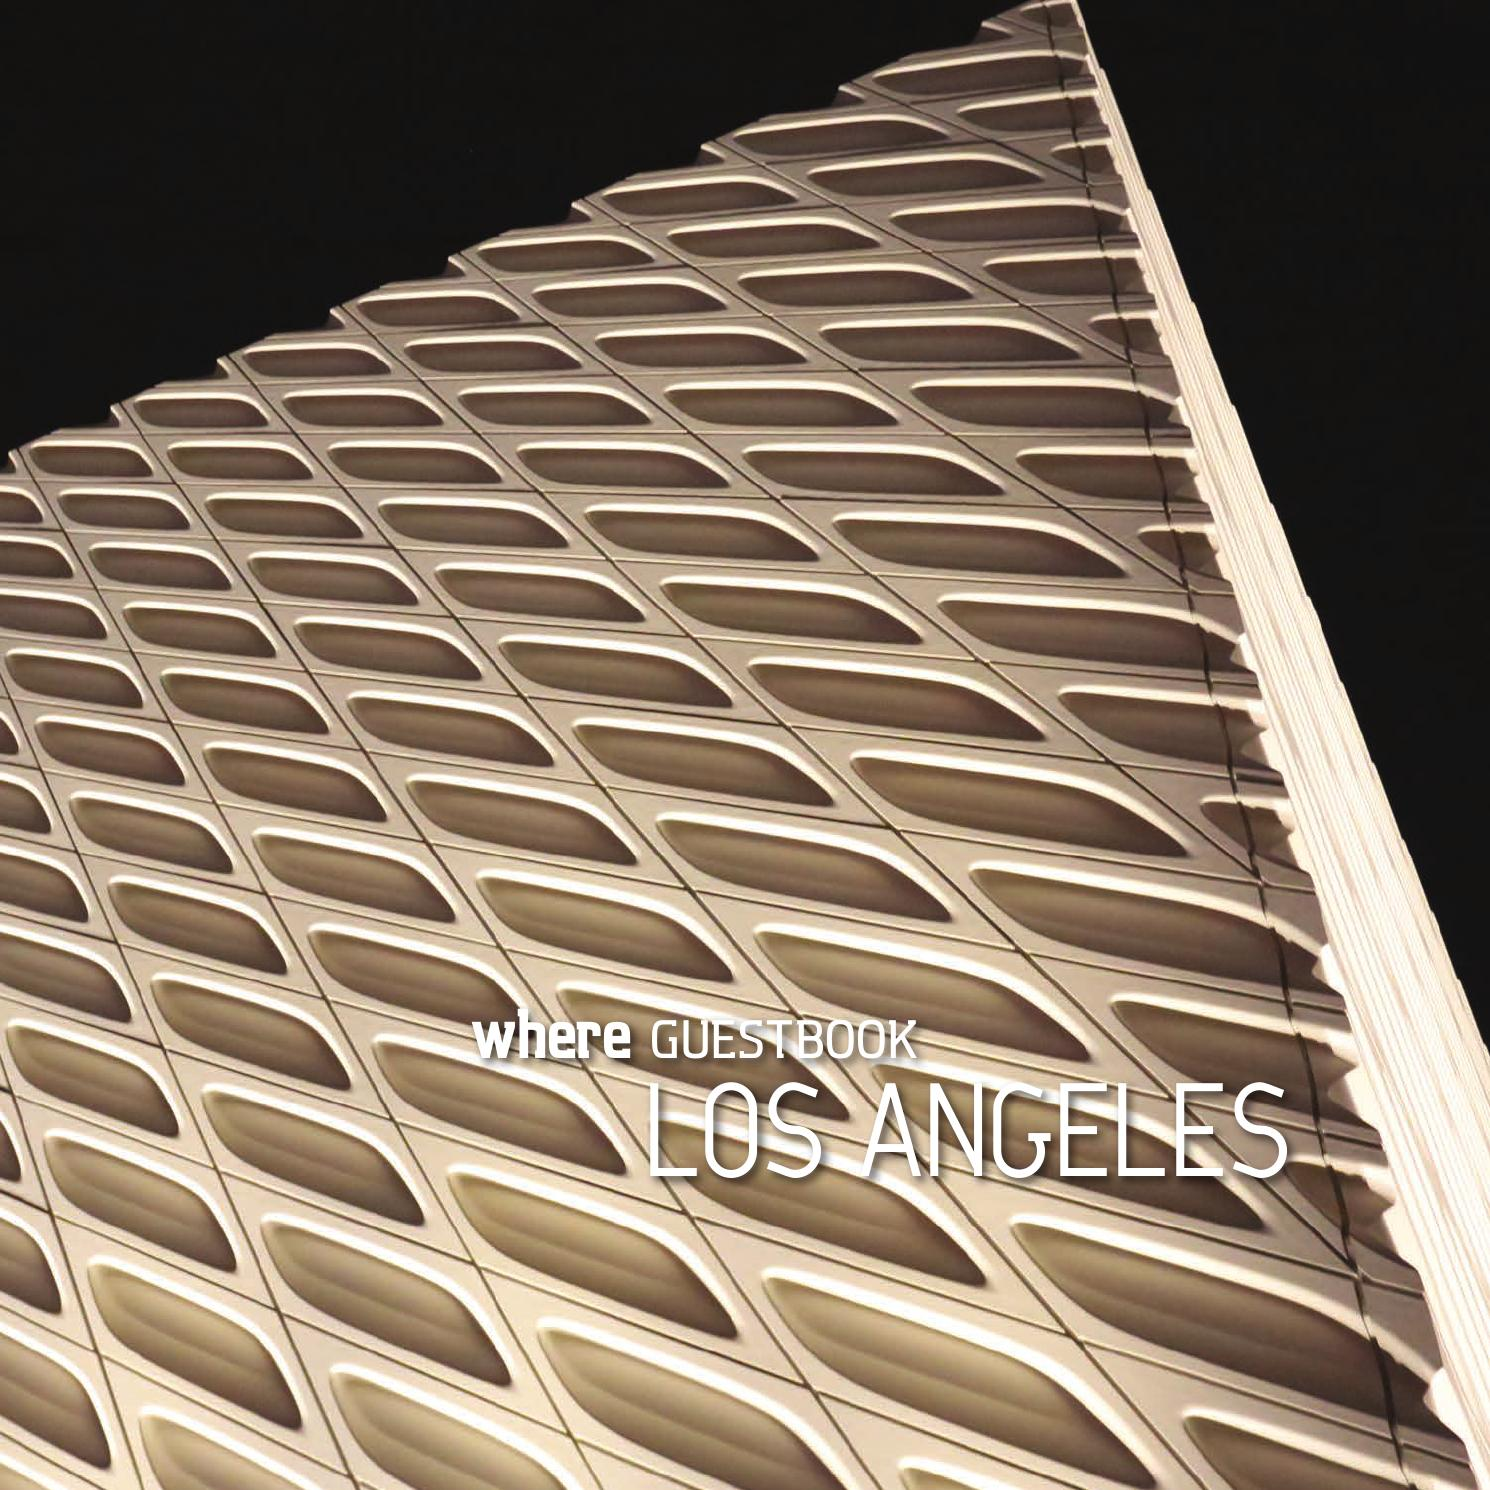 Where GuestBook Los Angeles 2018 by SoCalMedia issuu